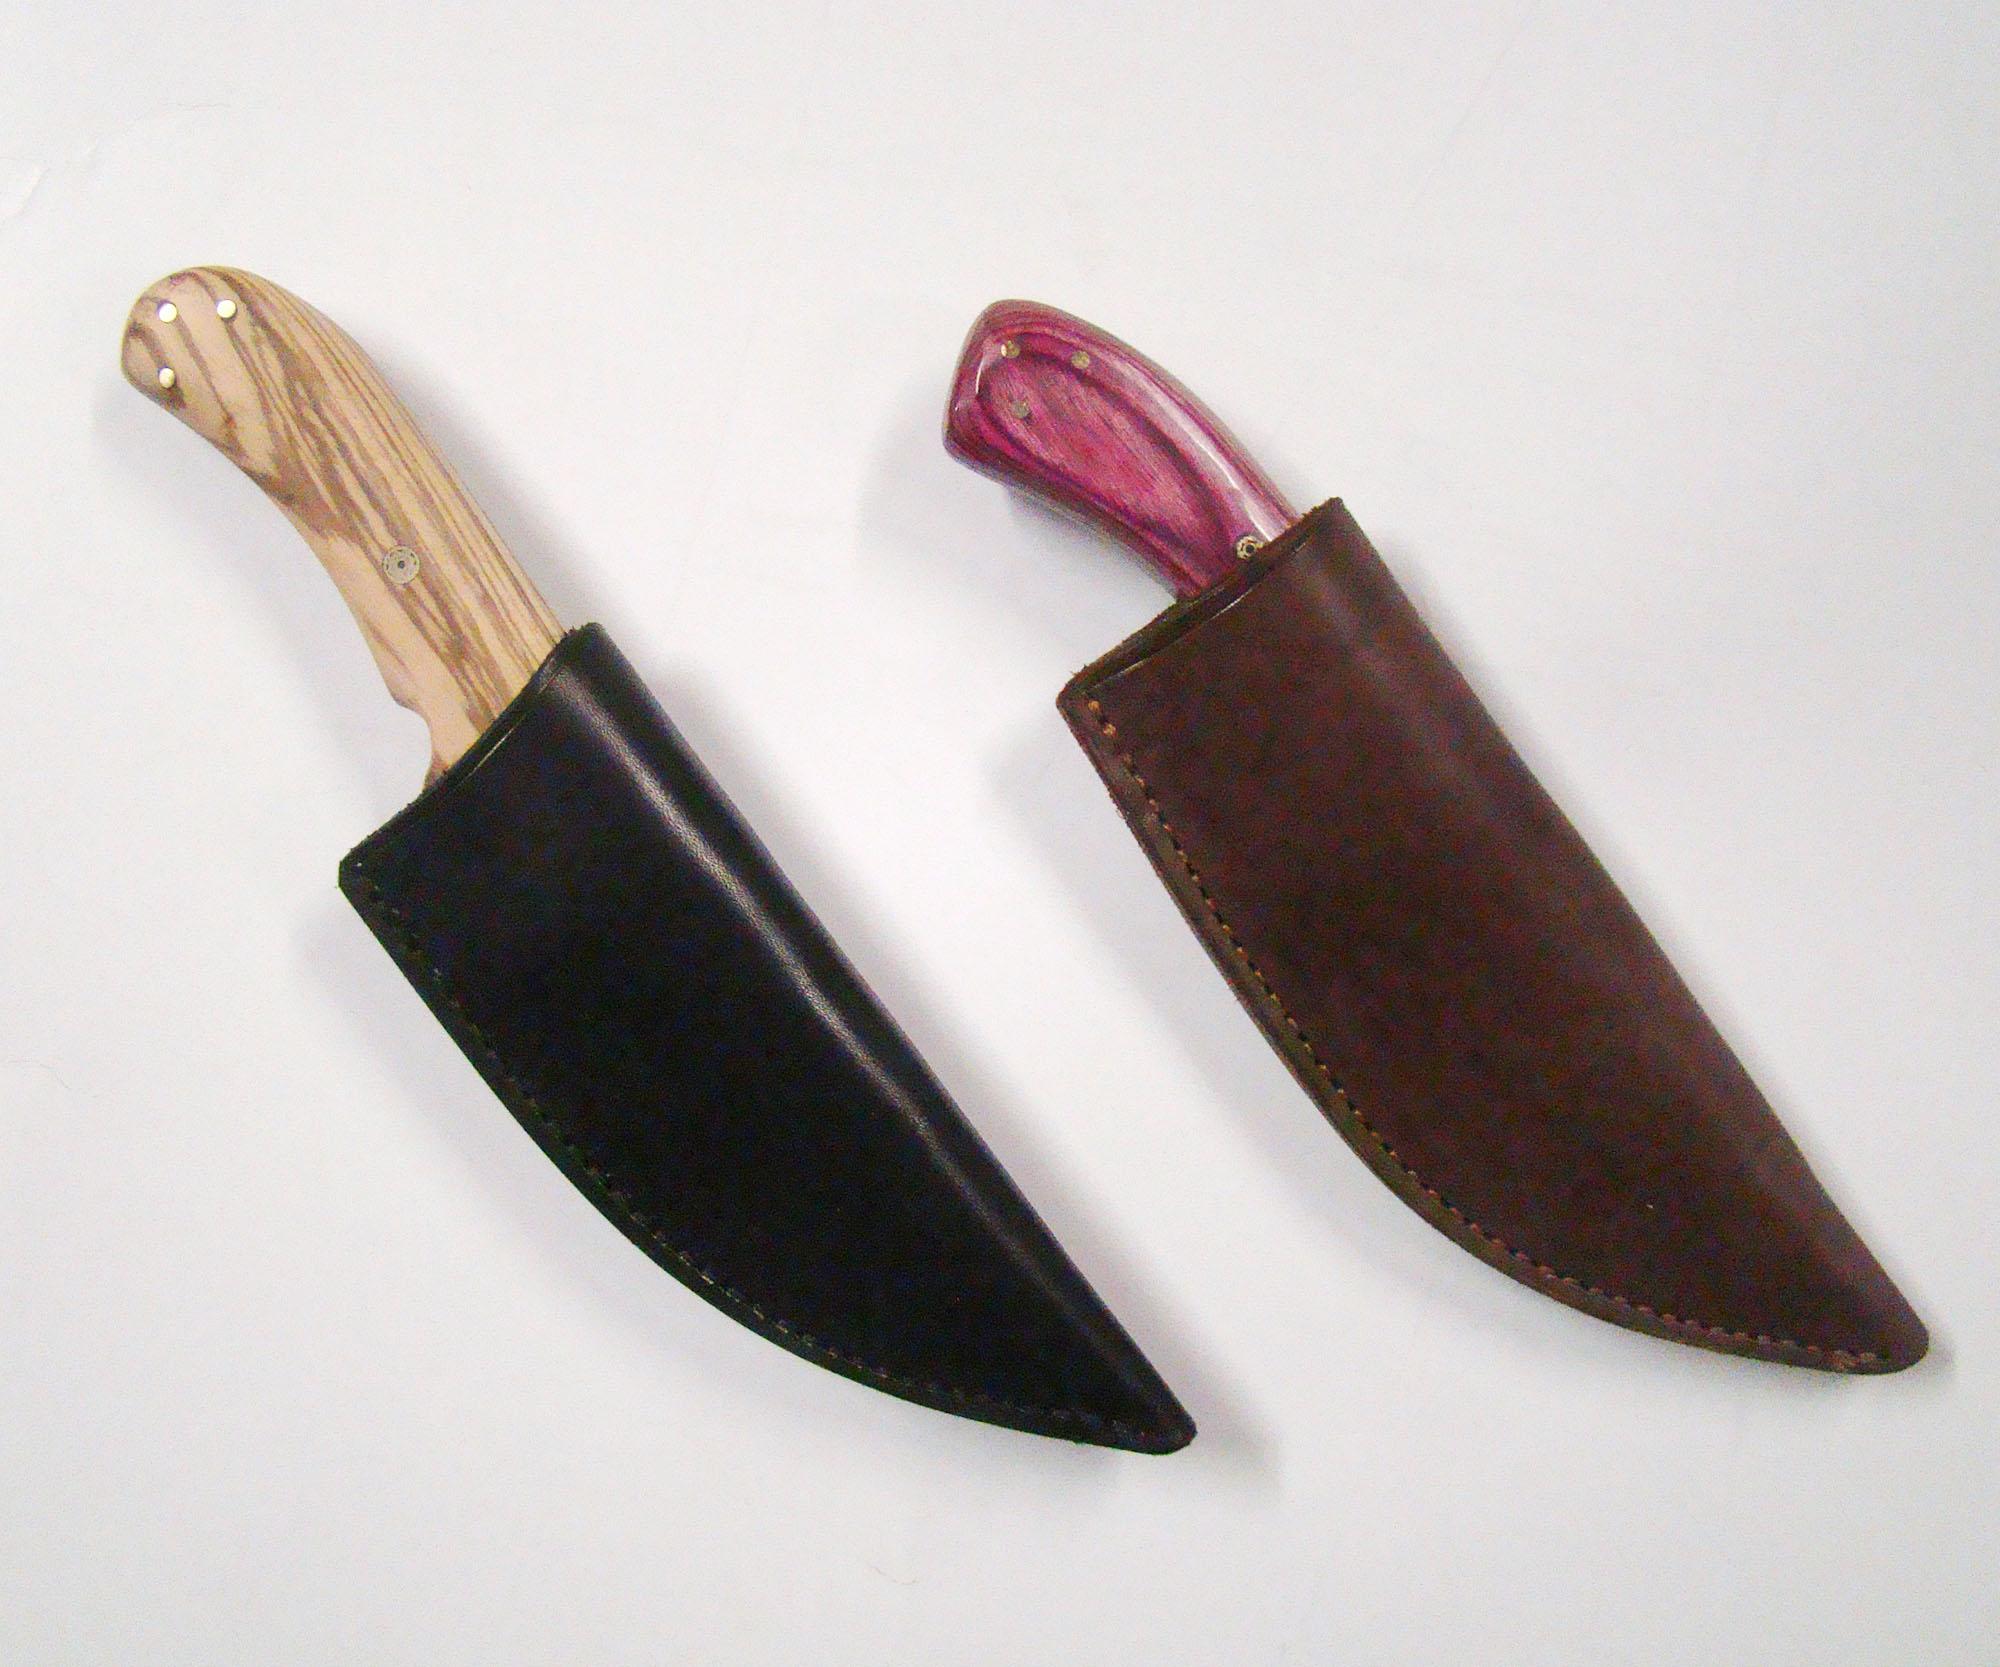 2 Knife sheaths